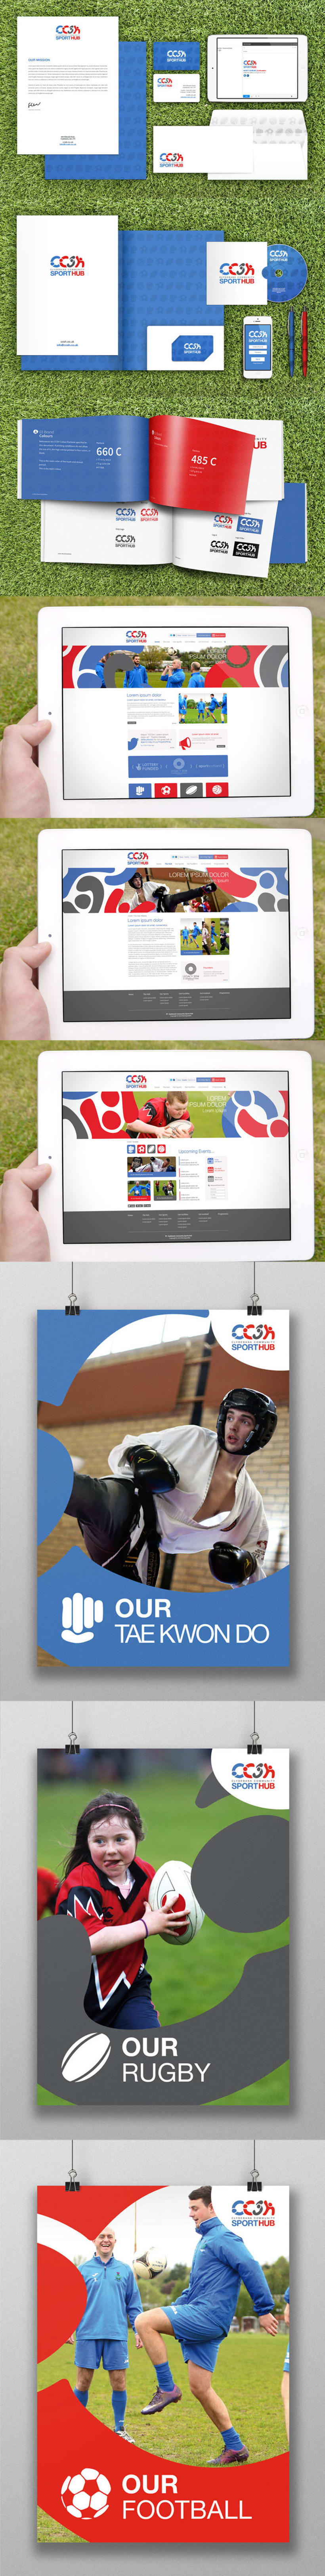 Clydebank Community Sports -1